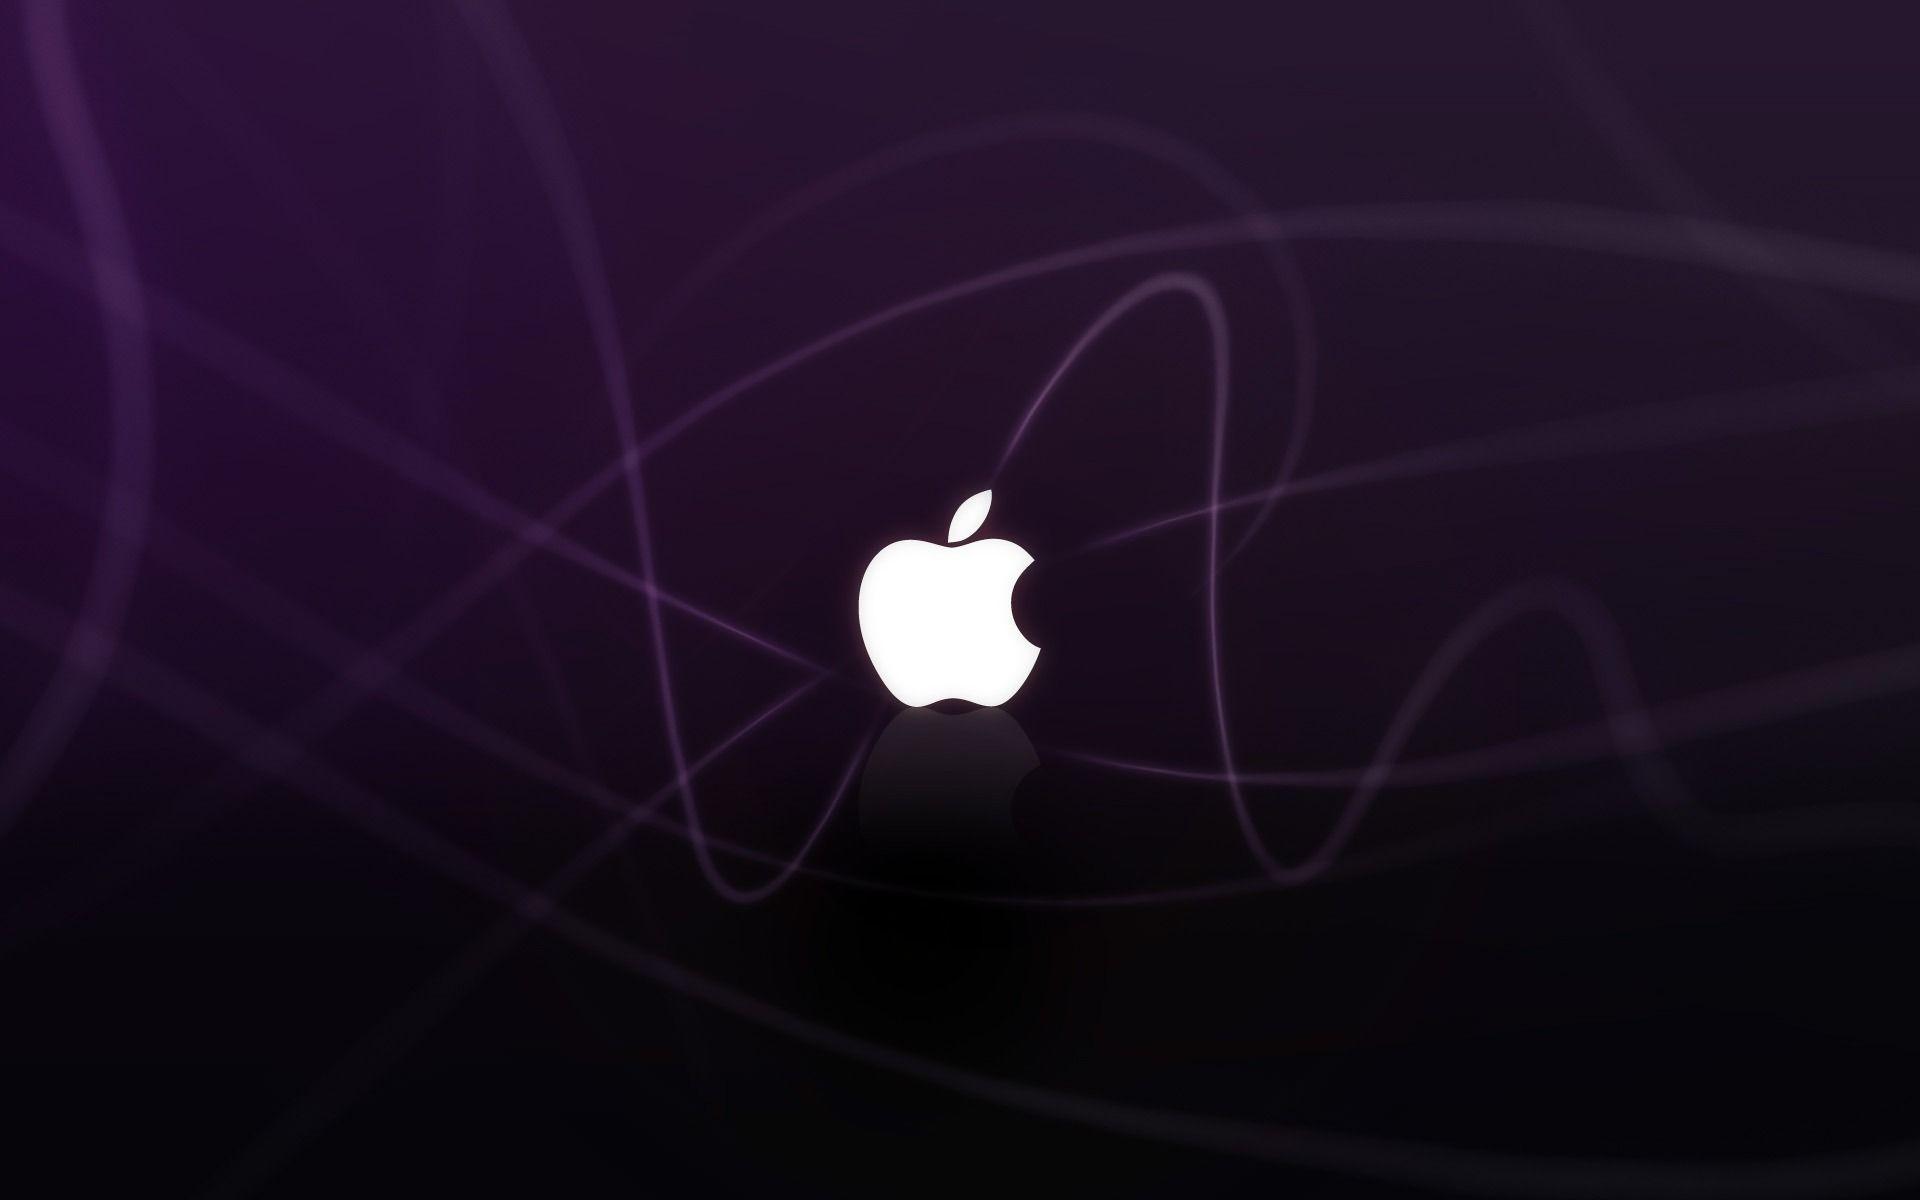 apple wallpaper maker desktop wallpaperchanel com